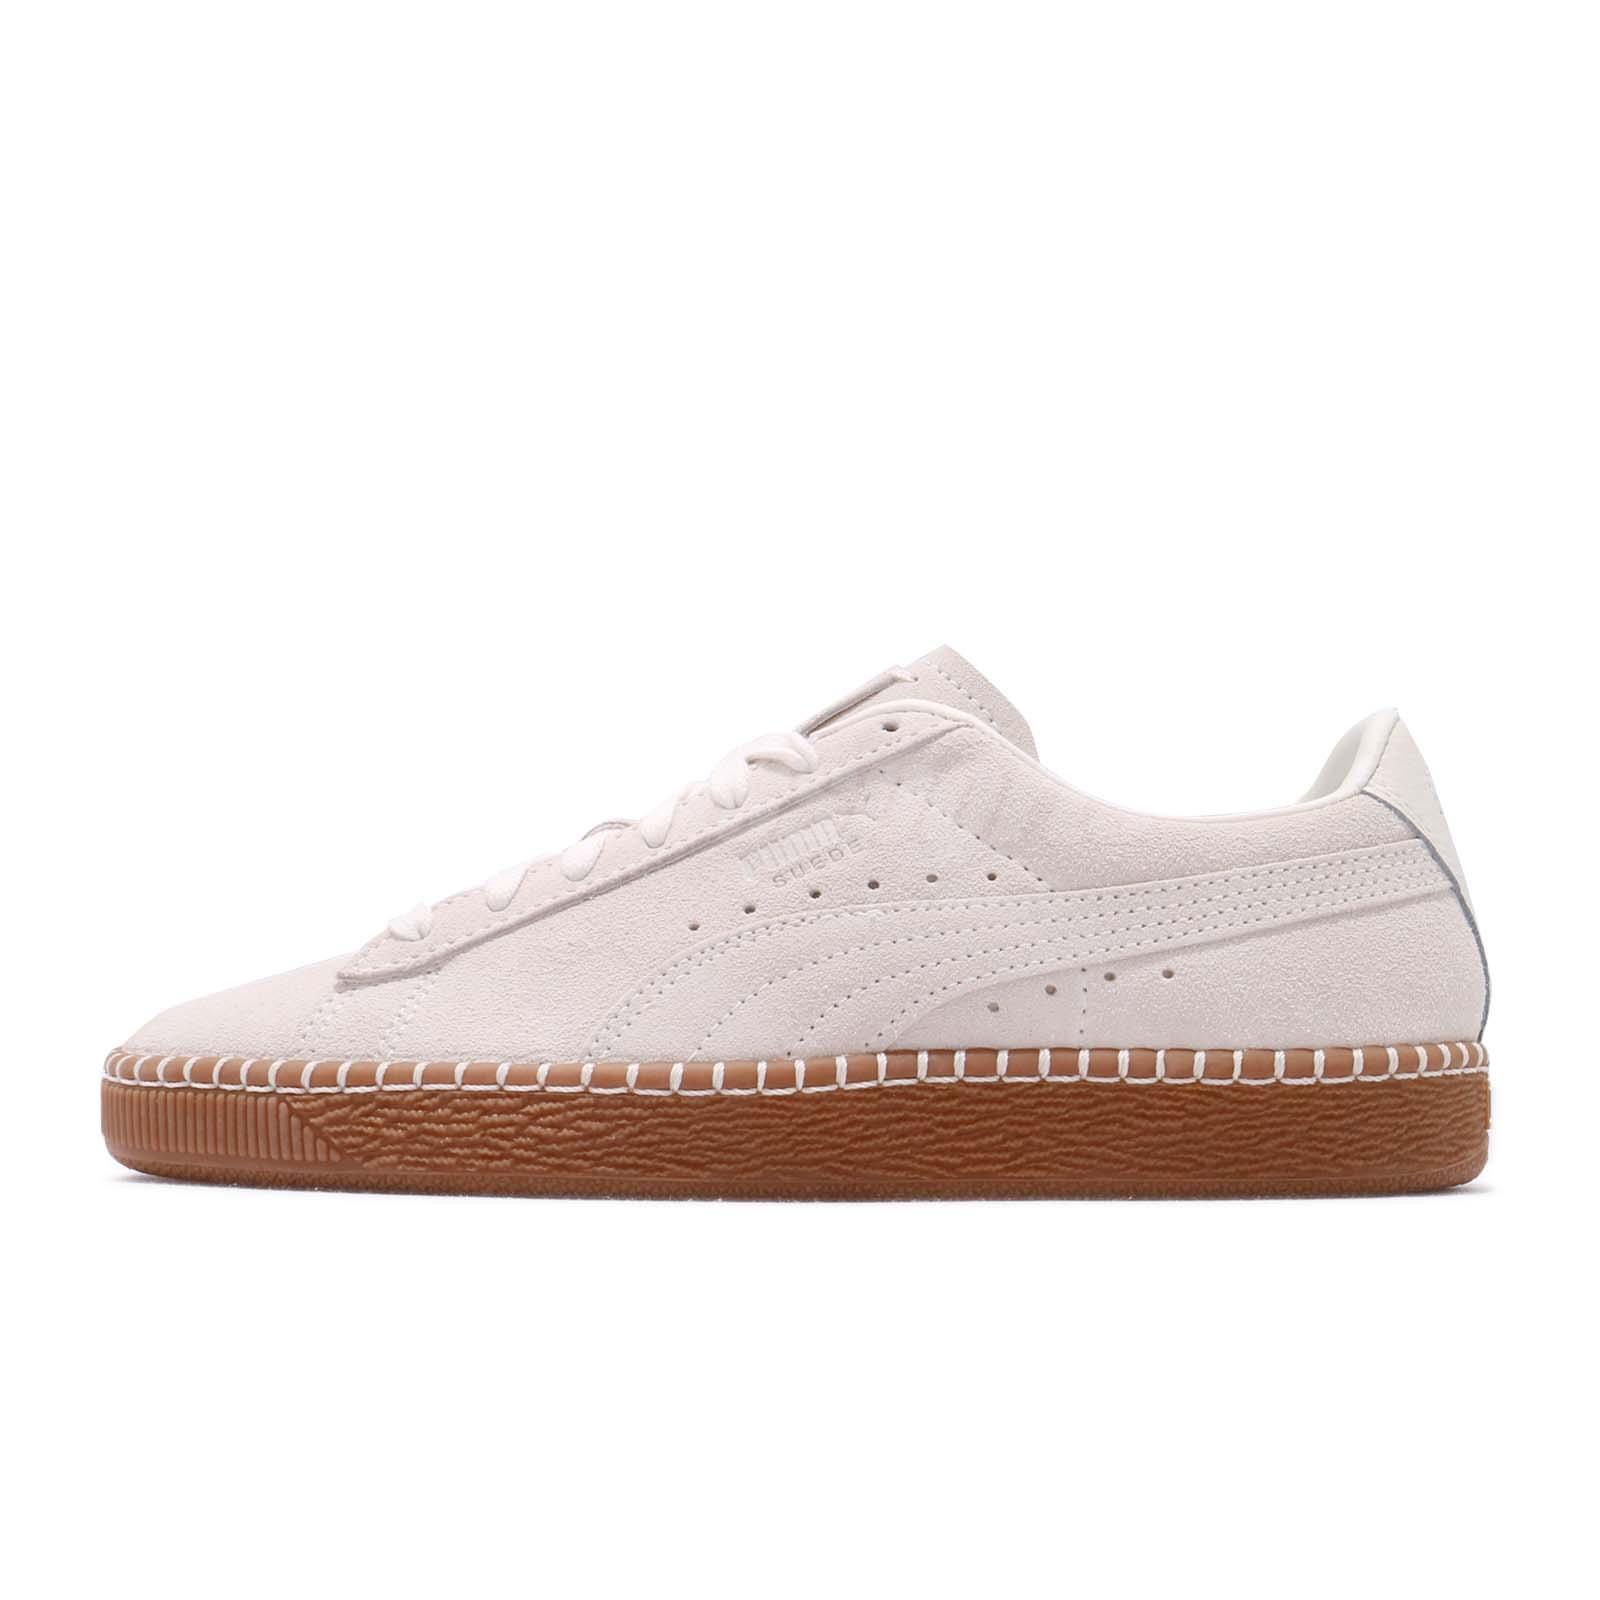 9a44753eb1 Details about Puma Suede Classic Blanket Stitch Whisper White Gum Men Women  Shoes 368903-03